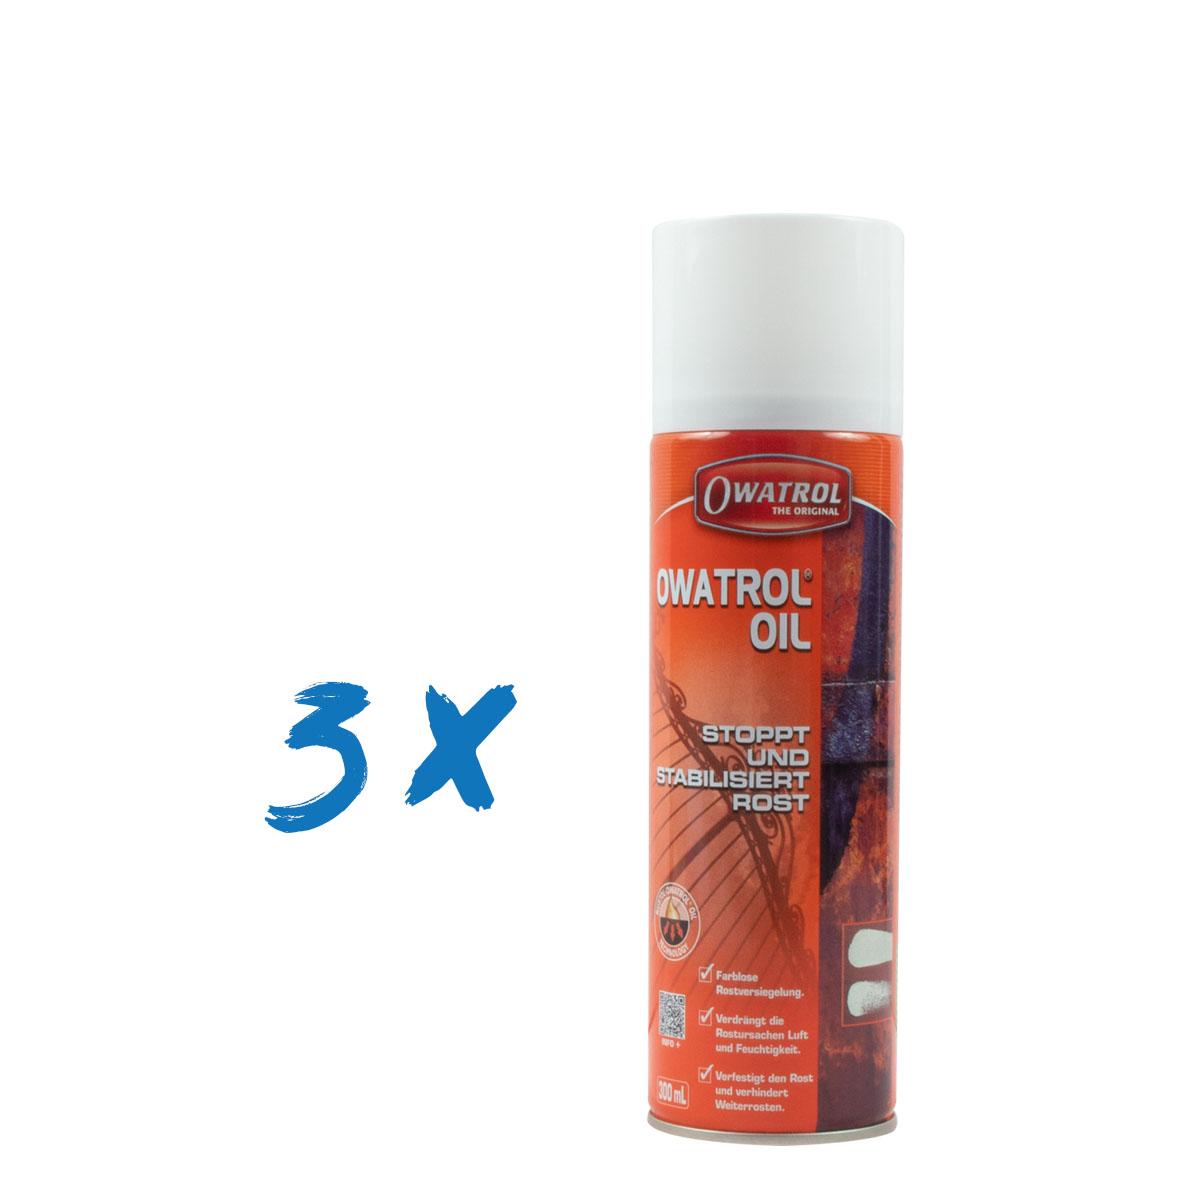 Owatrol Oel Spray 3x300ml, Mega Sparpack, Kriechöl, Rostumwandler